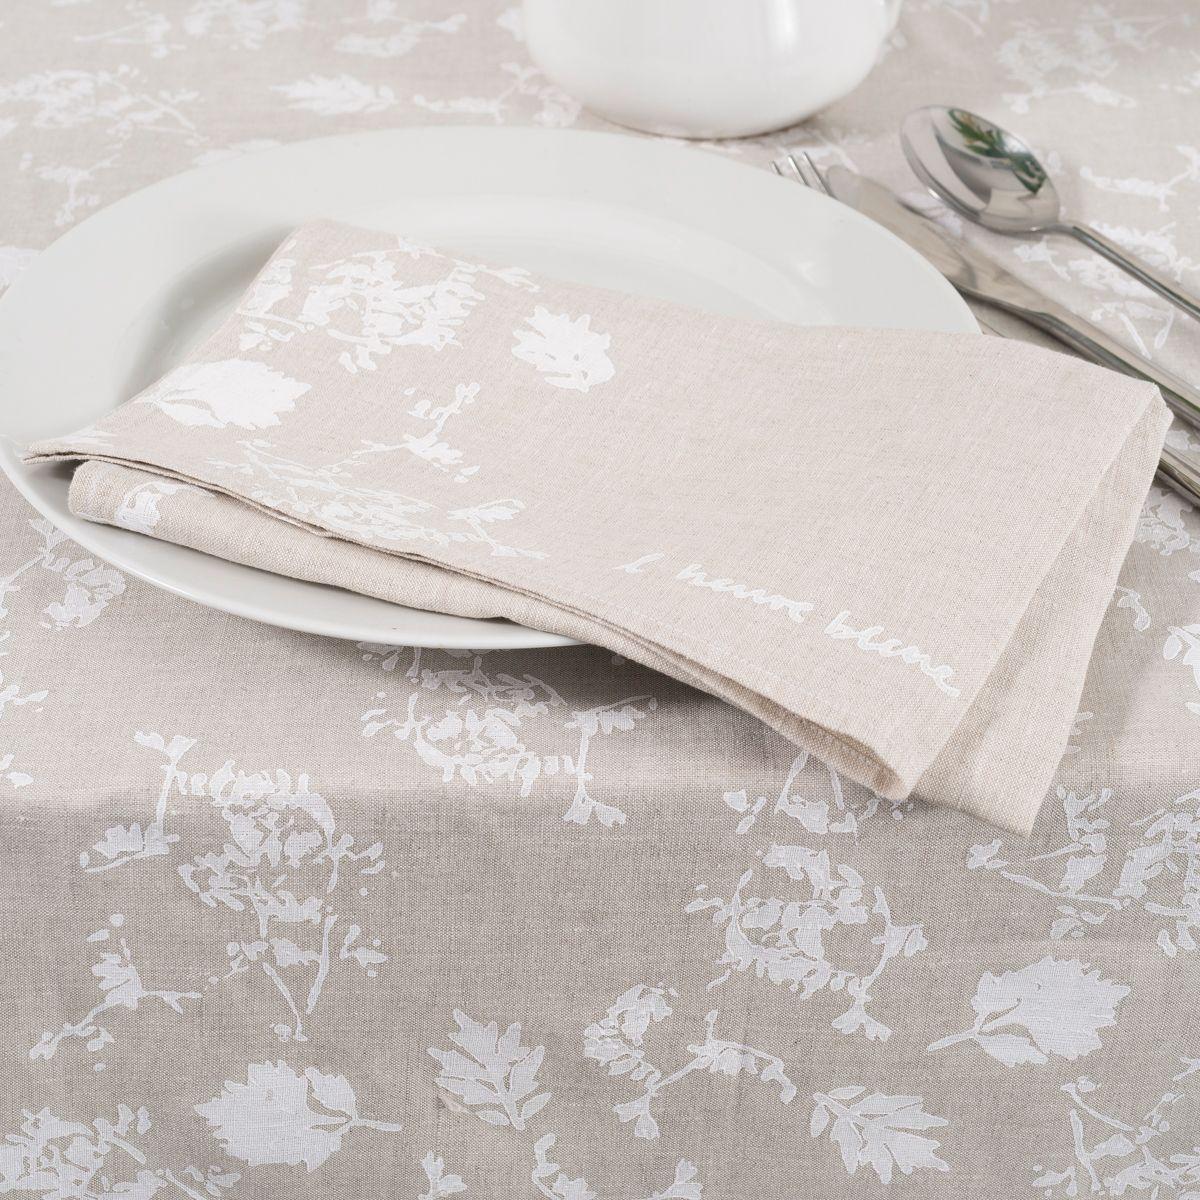 Hand Printed Linen Napkins Foglia Allora Hand Printed Linen Linen Napkins White Linen Napkins